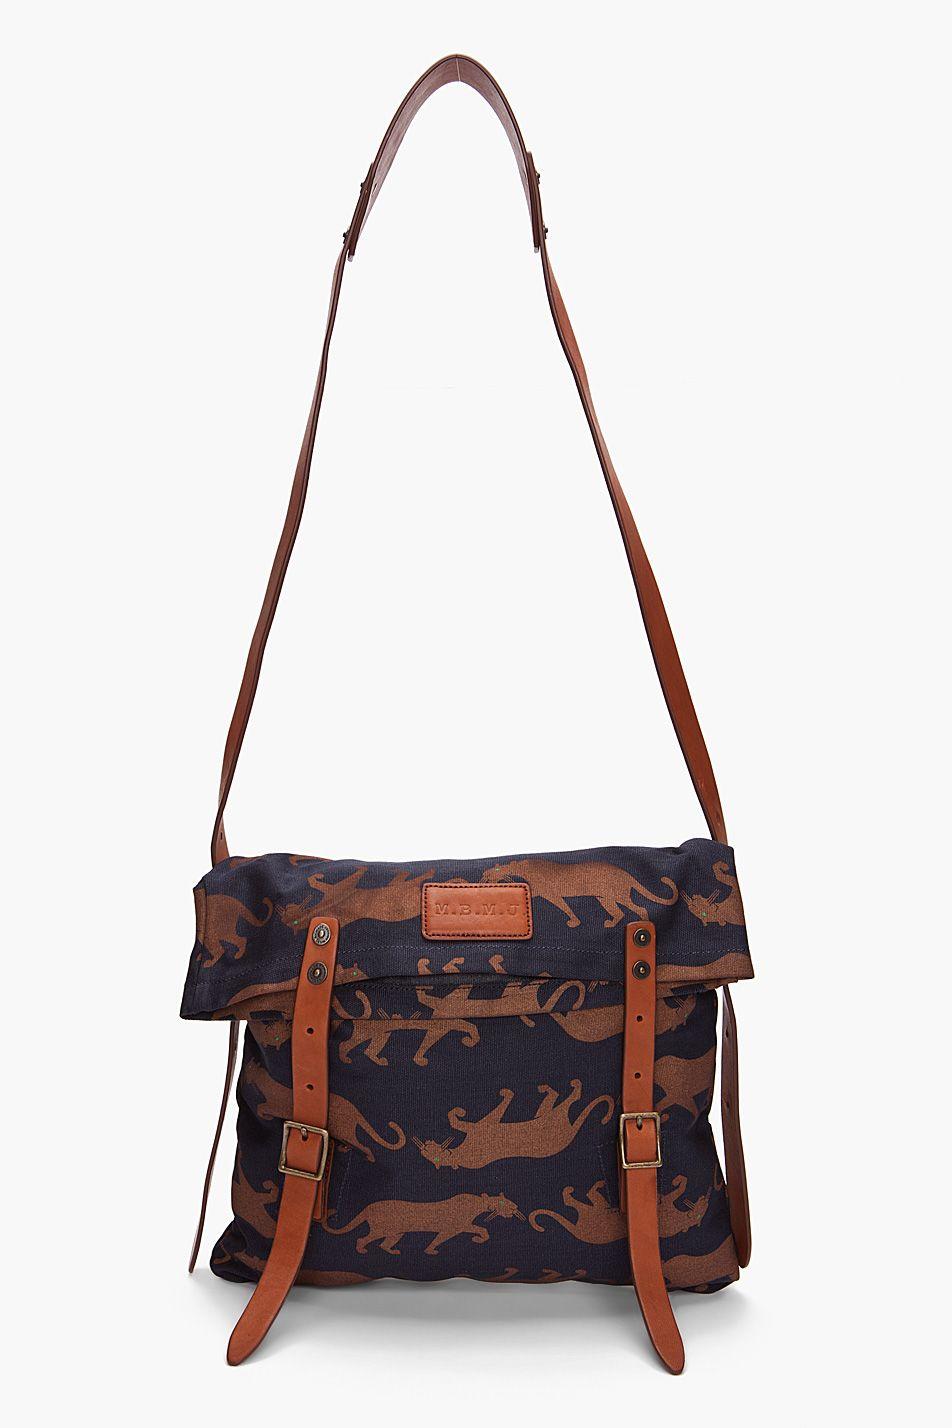 M.B.M.J. - Panther Messenger Bag  4239e92c43f50